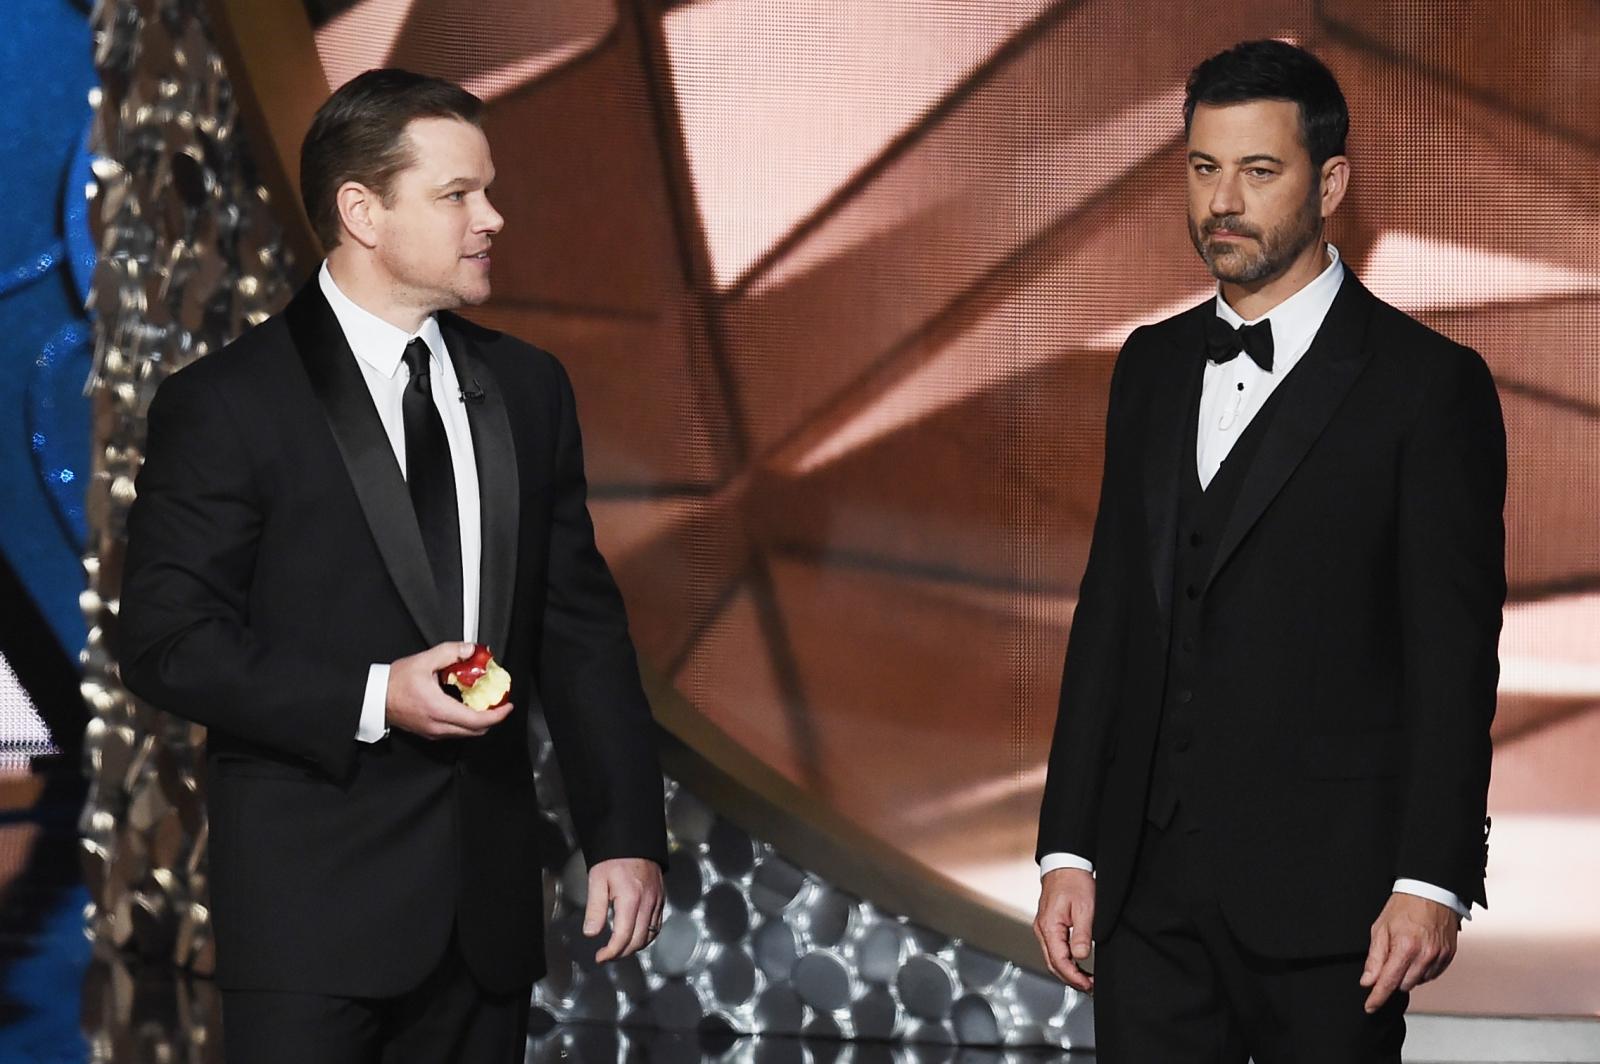 Matt Damon and Jimmy Kimmel